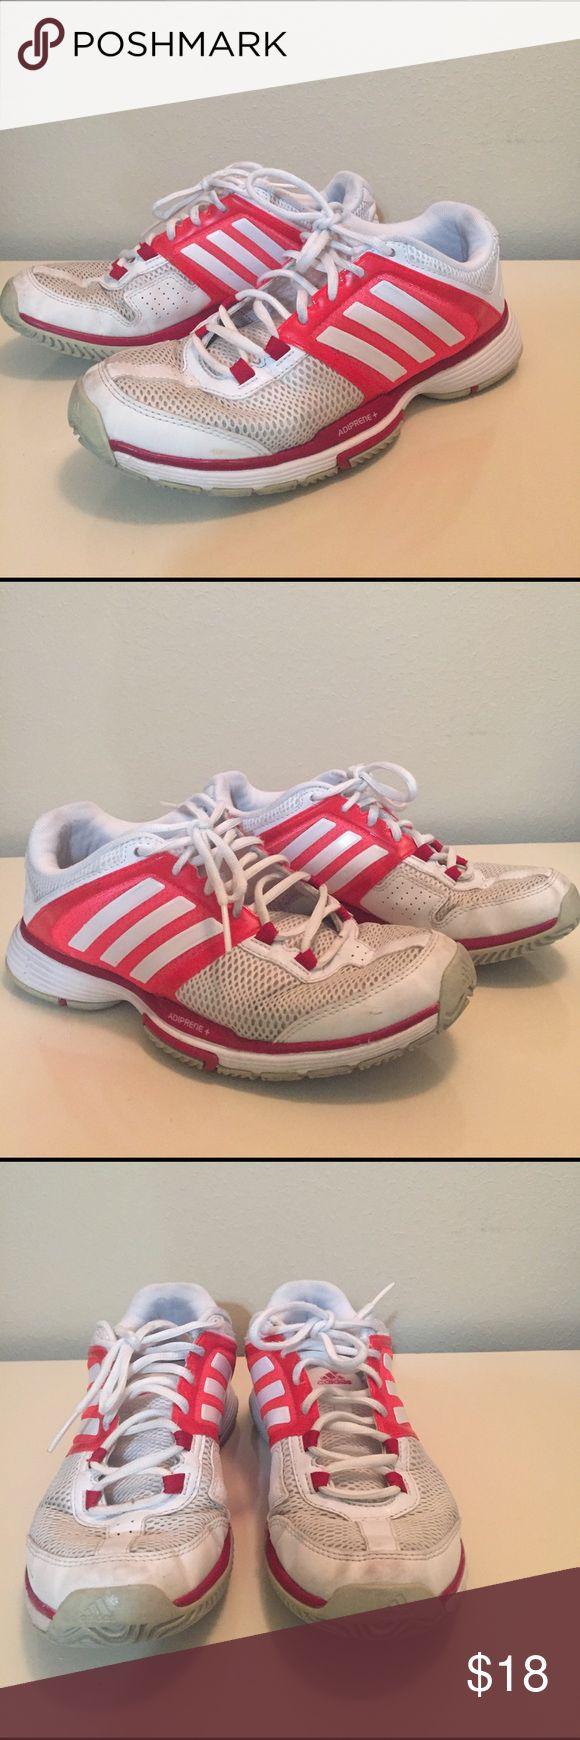 Adidas Adiprene Adidas Adiprene tennis shoes #9. White/red. Not like new but still useful. Adidas Shoes Athletic Shoes